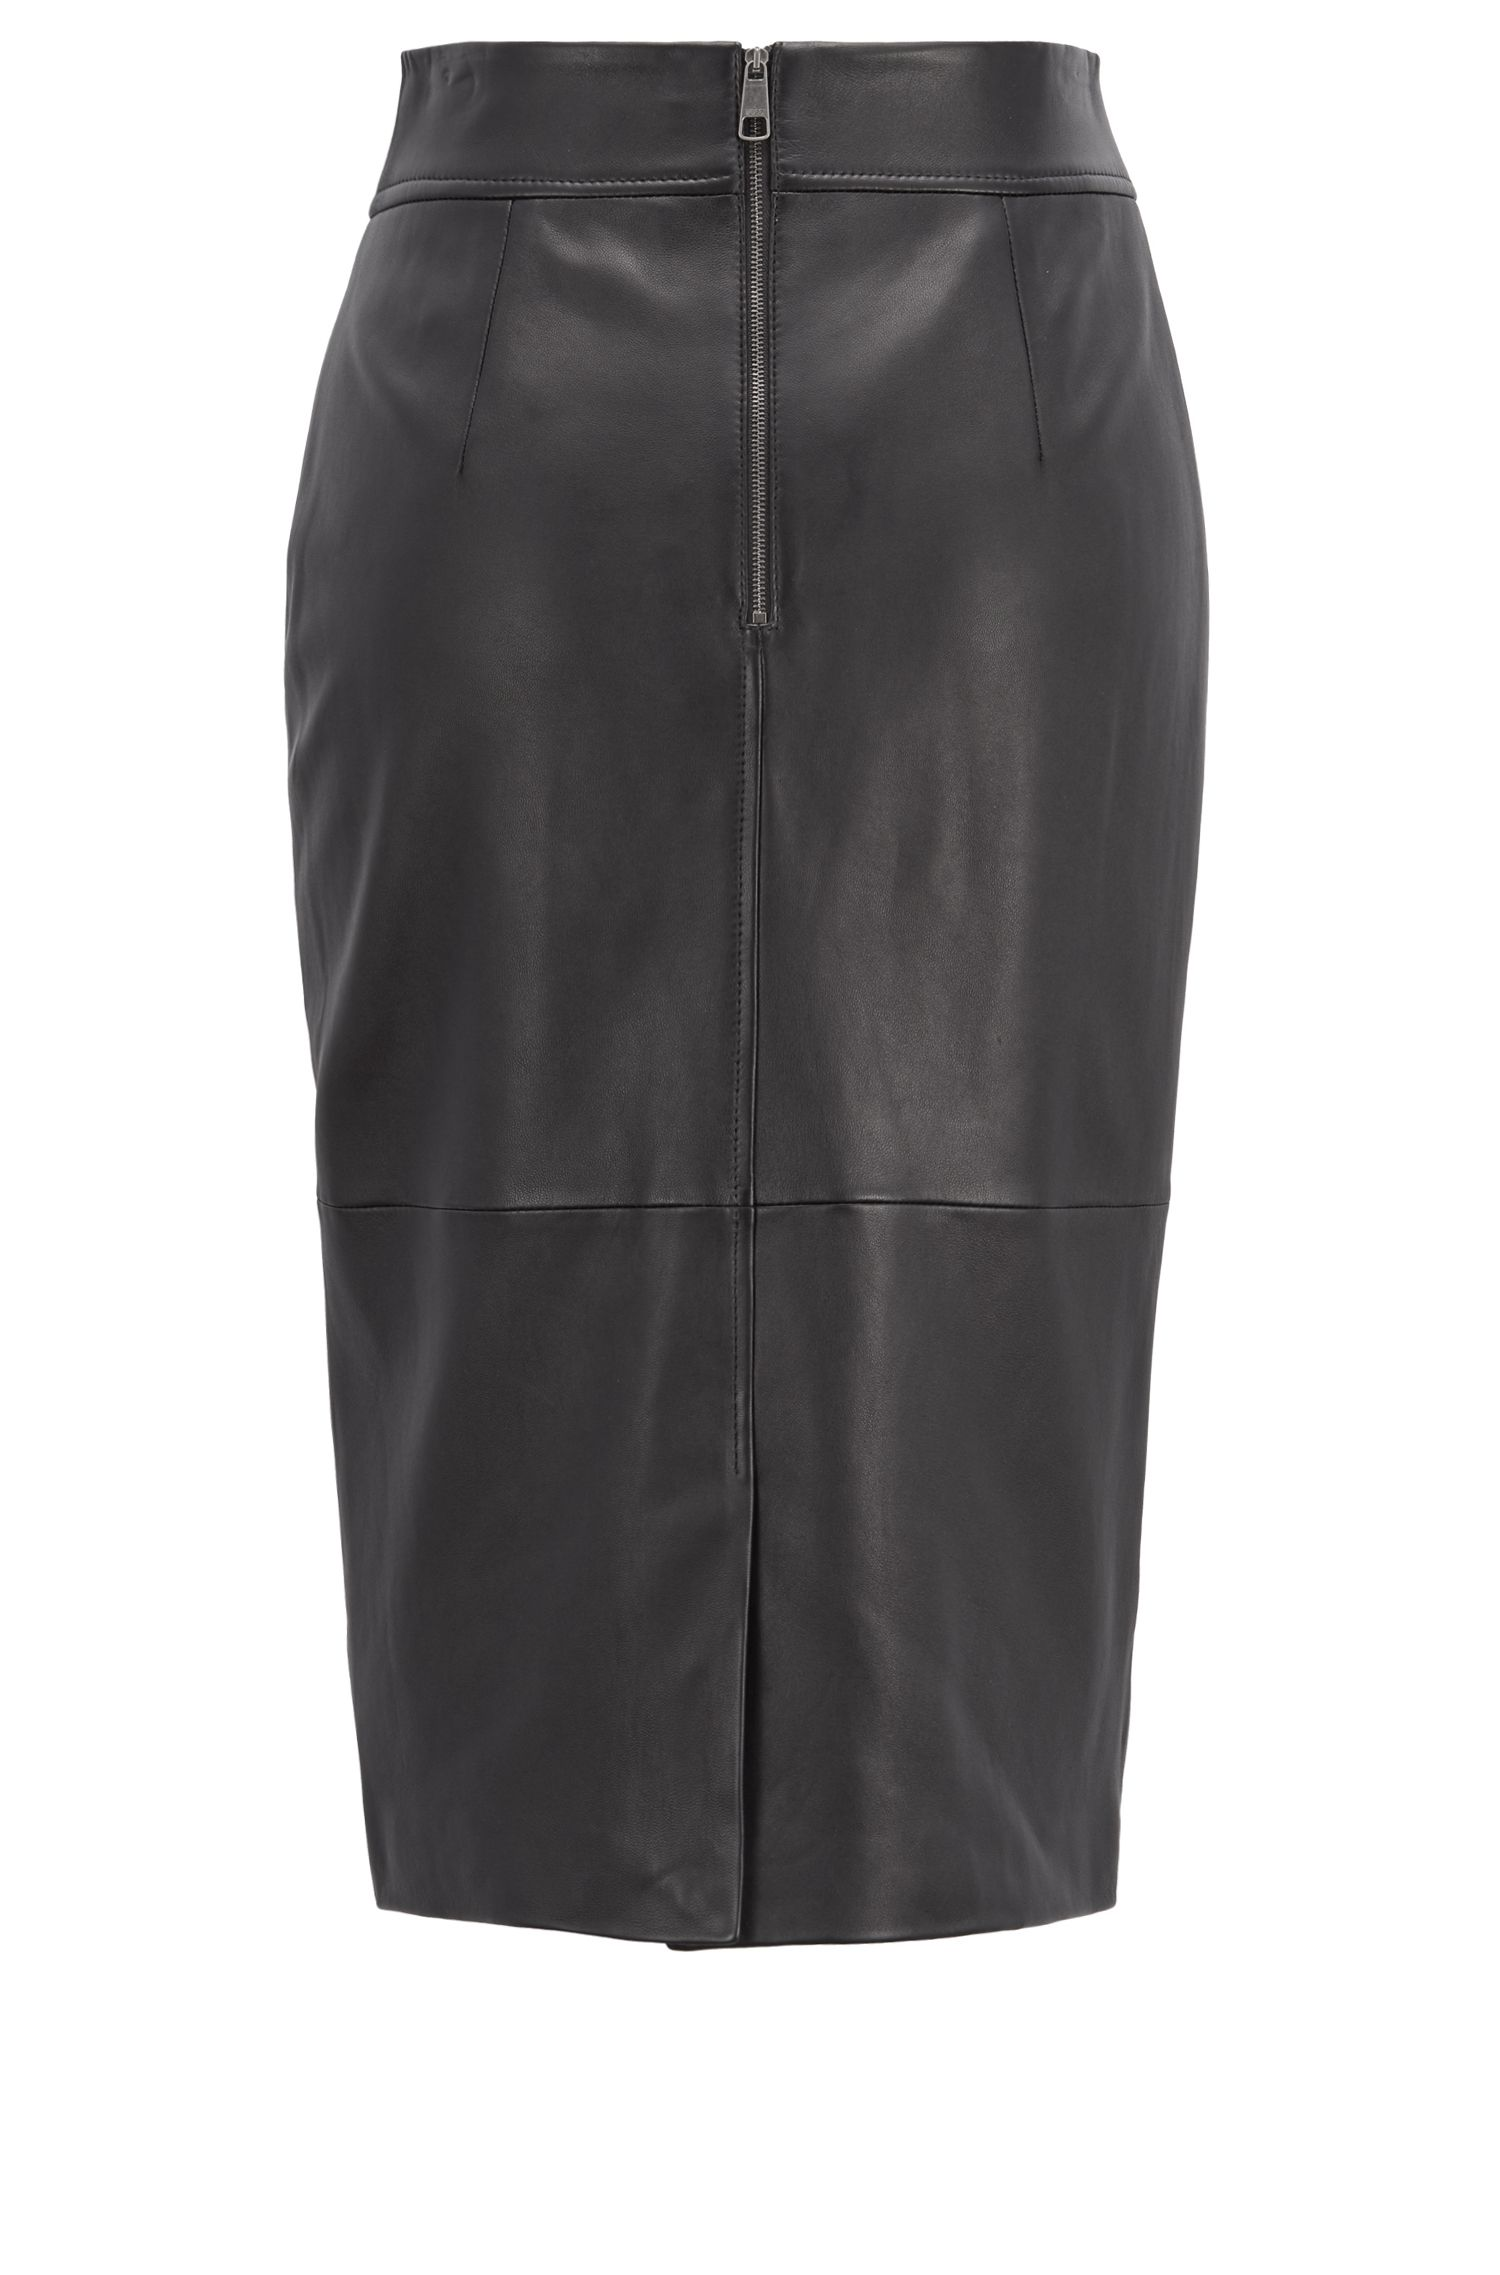 Hugo Boss - Regular-fit pencil skirt in lambskin - 5